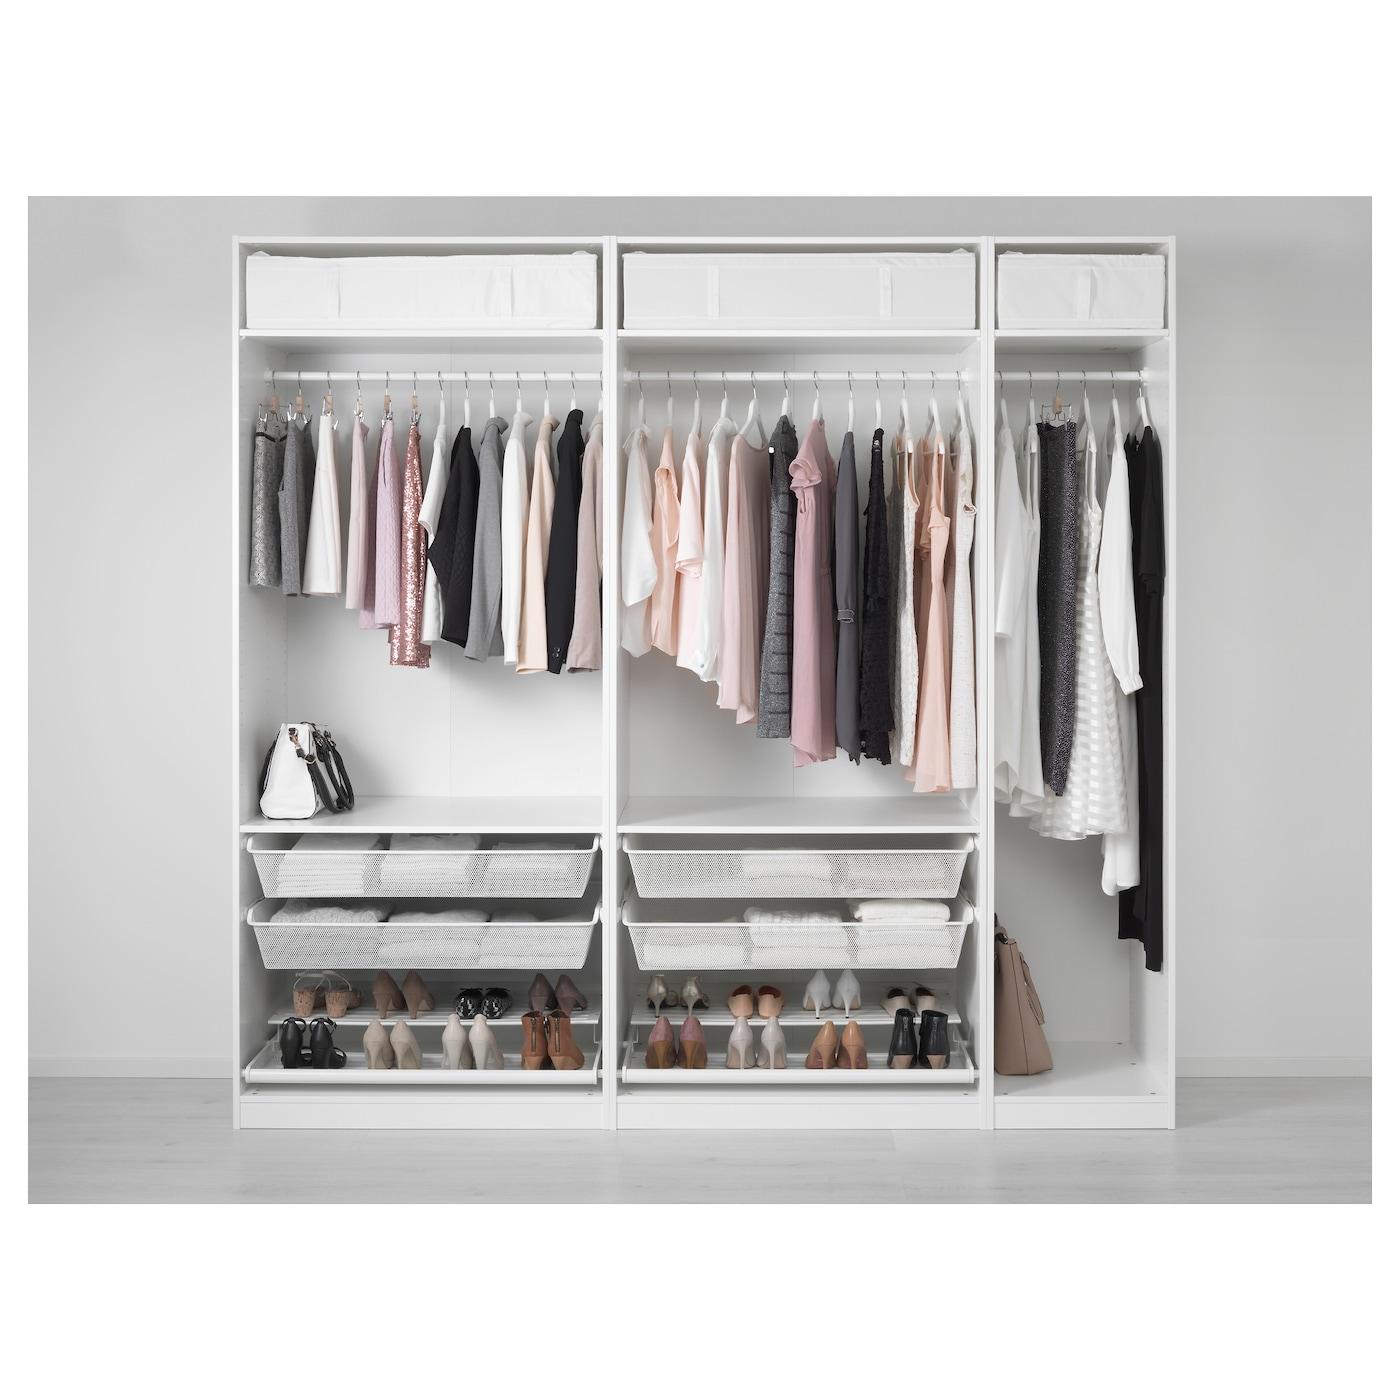 m bel online angebote 1291 bis 1300 bei ikea im online shop seite 130. Black Bedroom Furniture Sets. Home Design Ideas